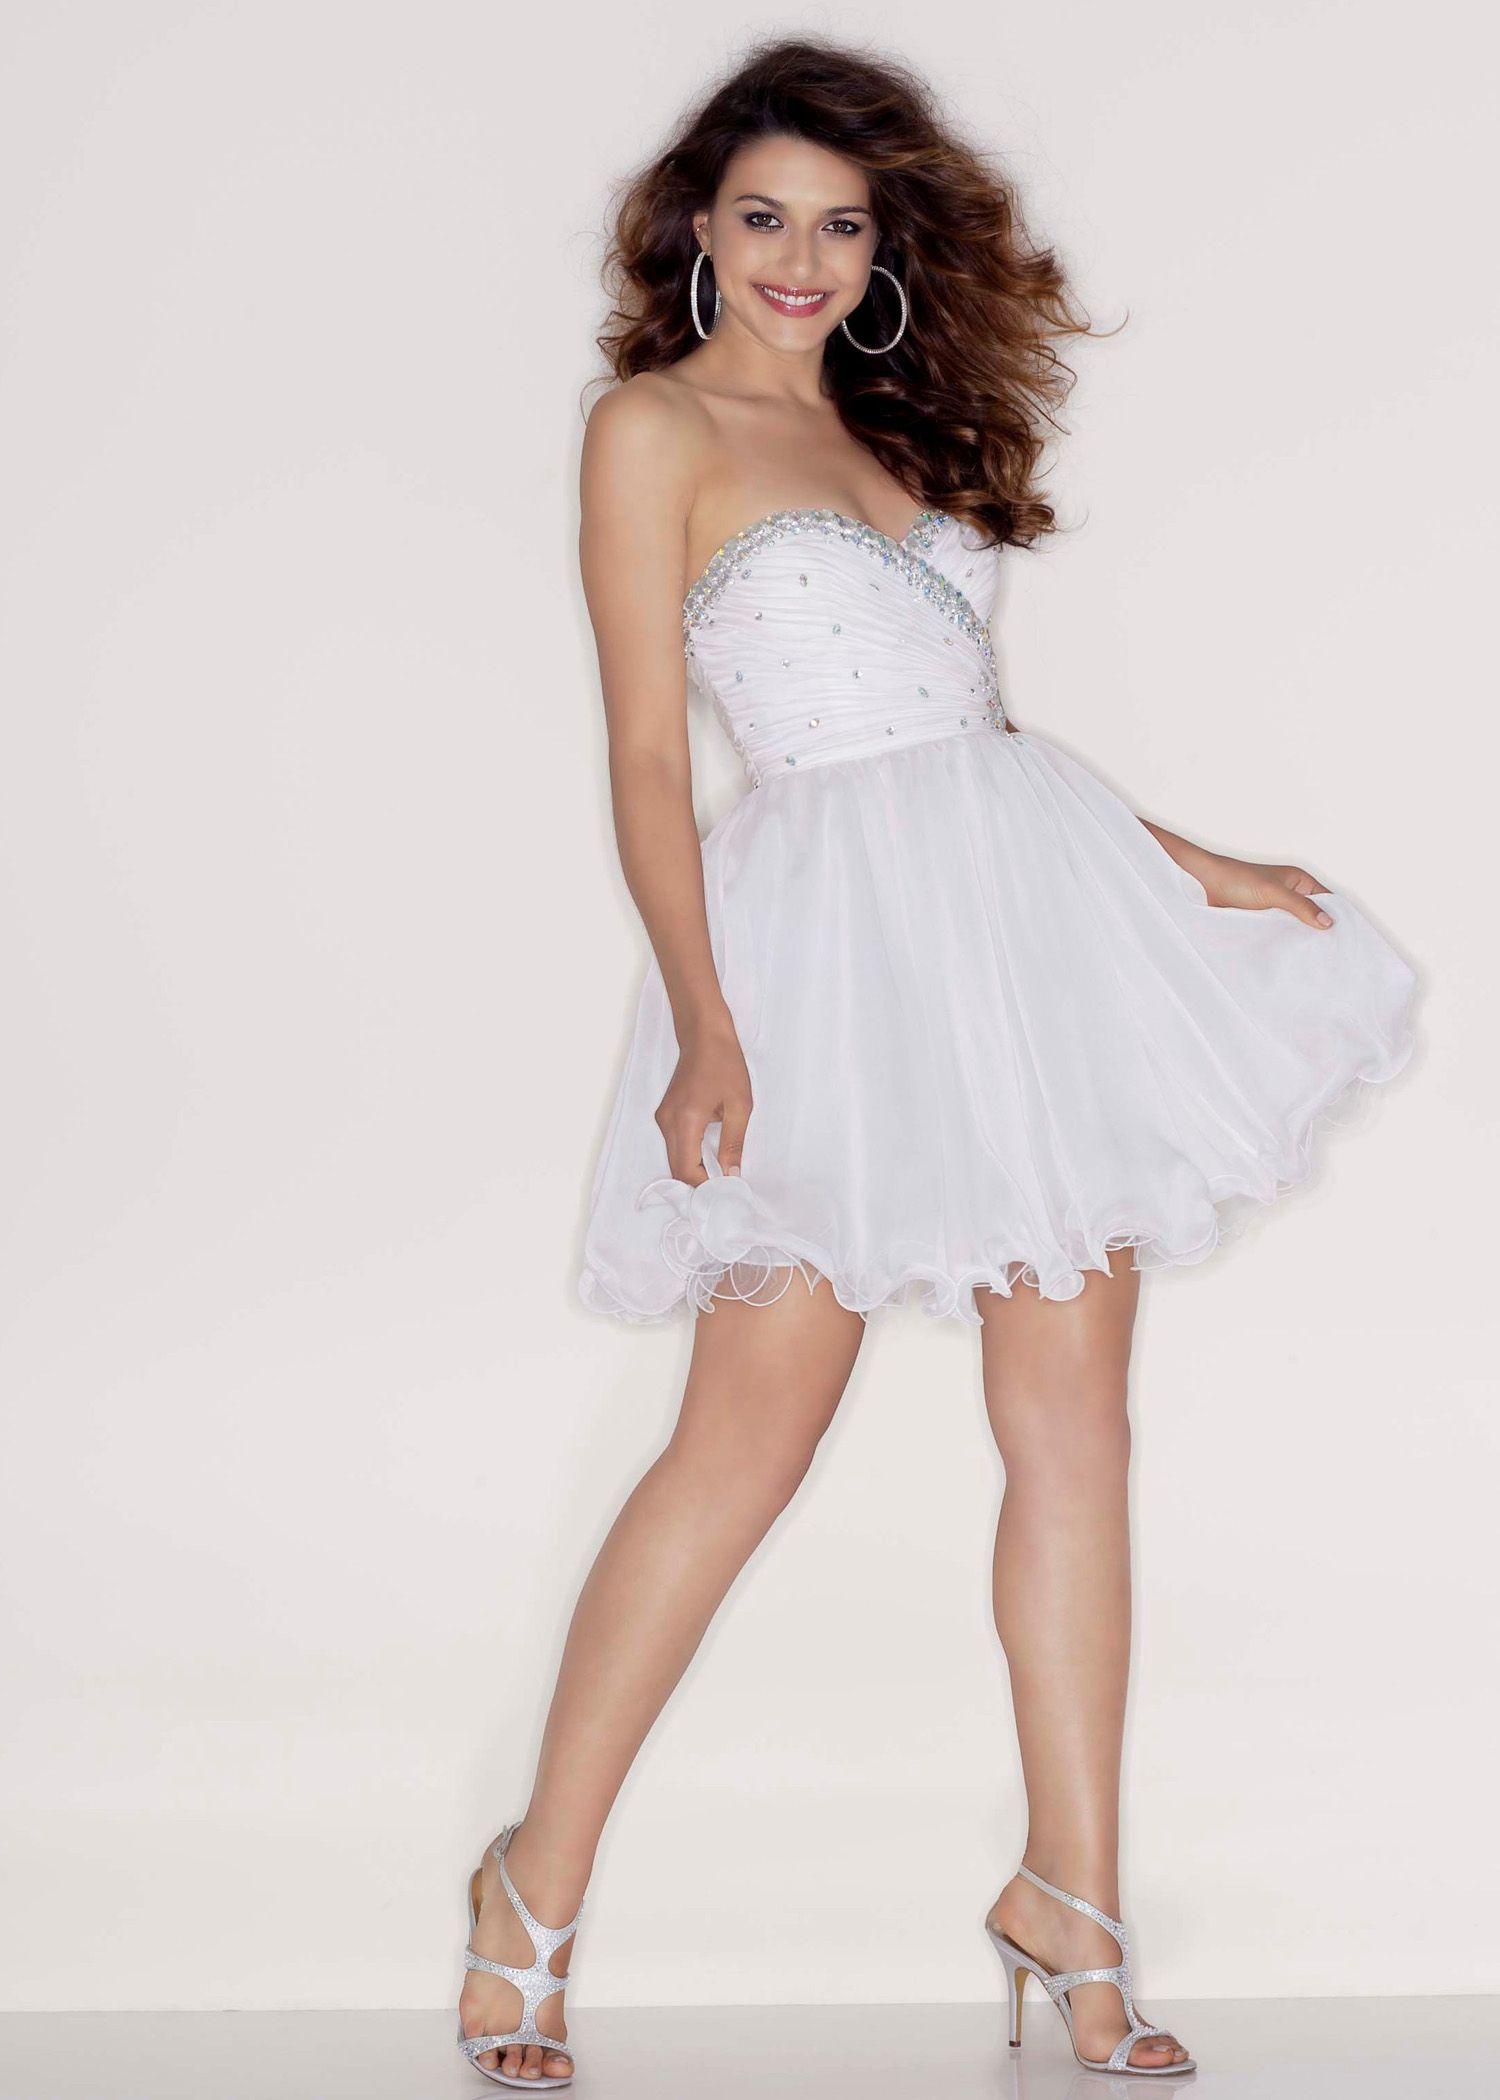 Stunning Beaded White Chiffon Short Prom Dress - Sticks and Stones ...